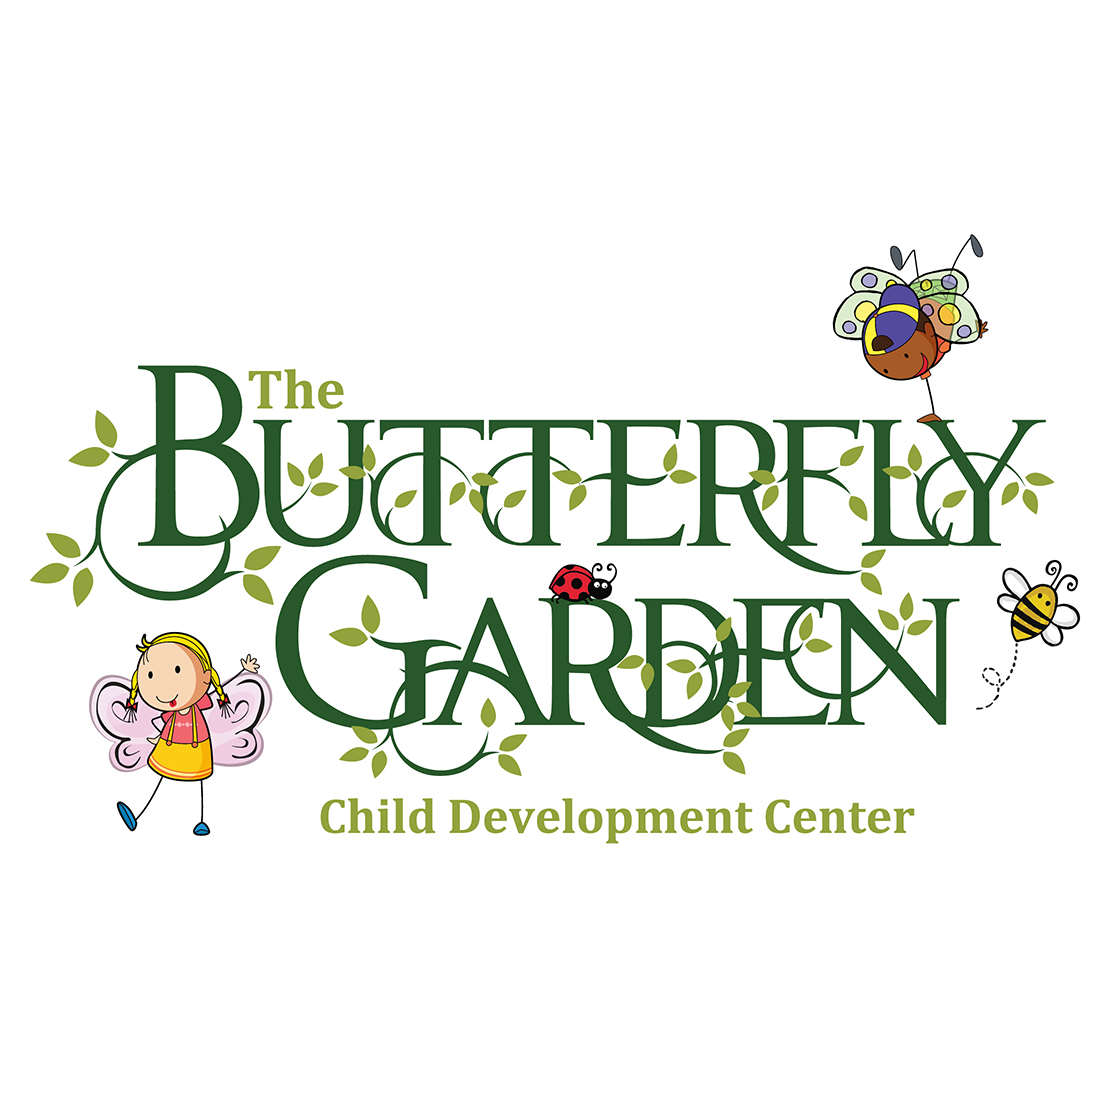 The Butterfly Garden Child Development Center